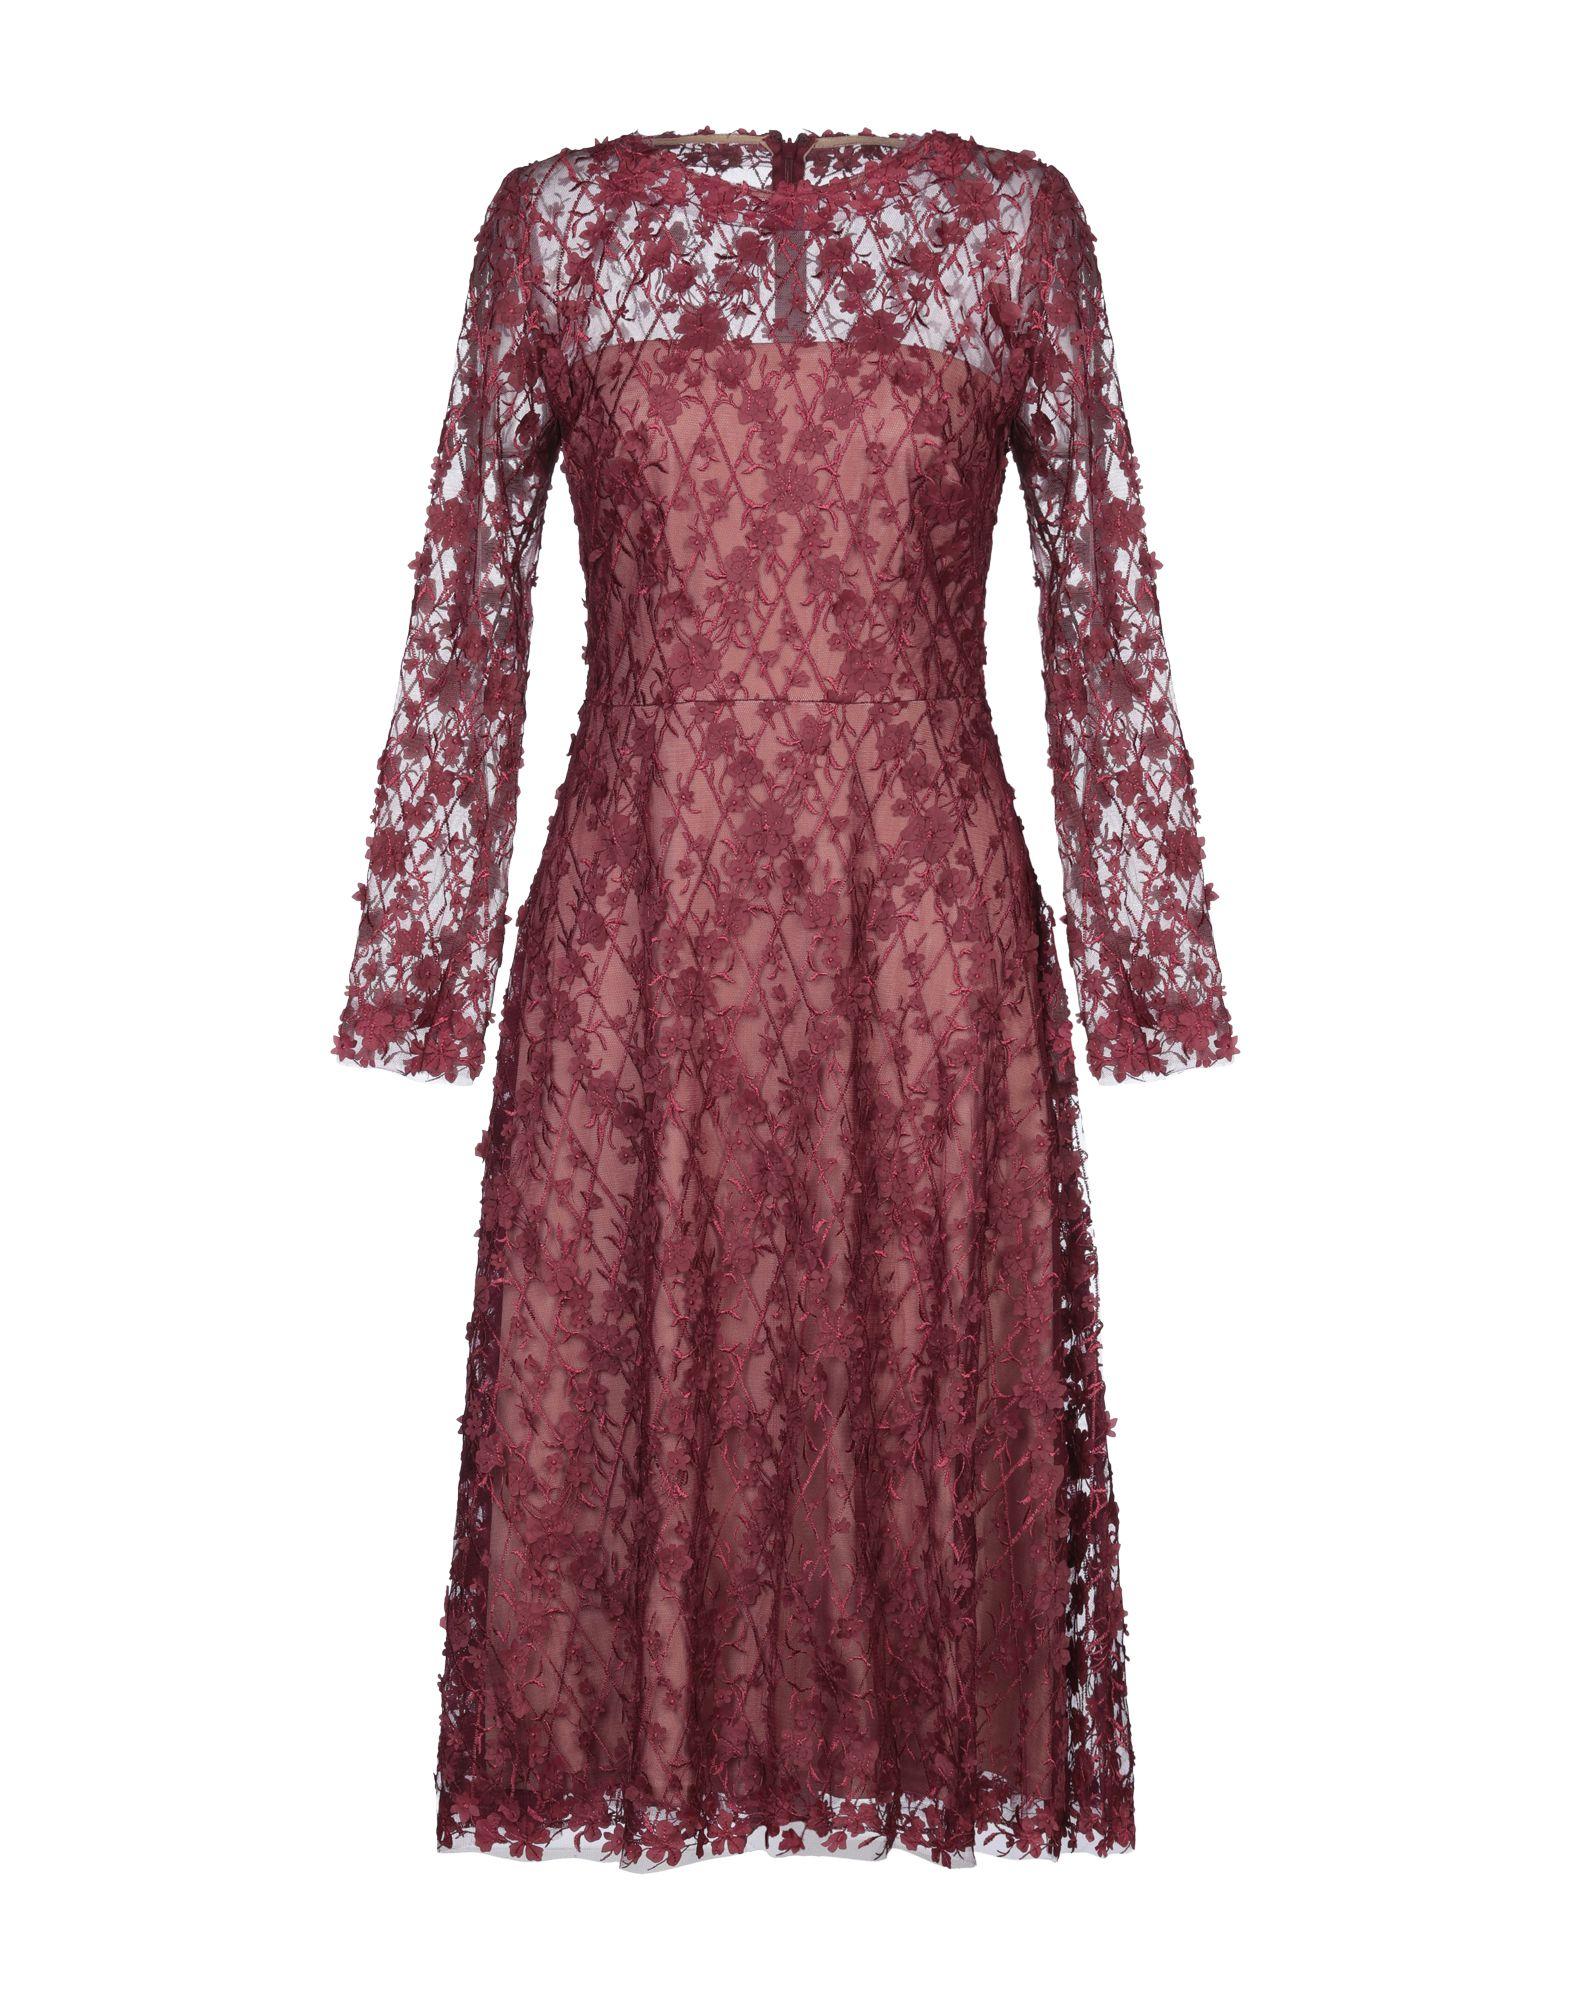 TADASHI SHOJI Платье длиной 3/4